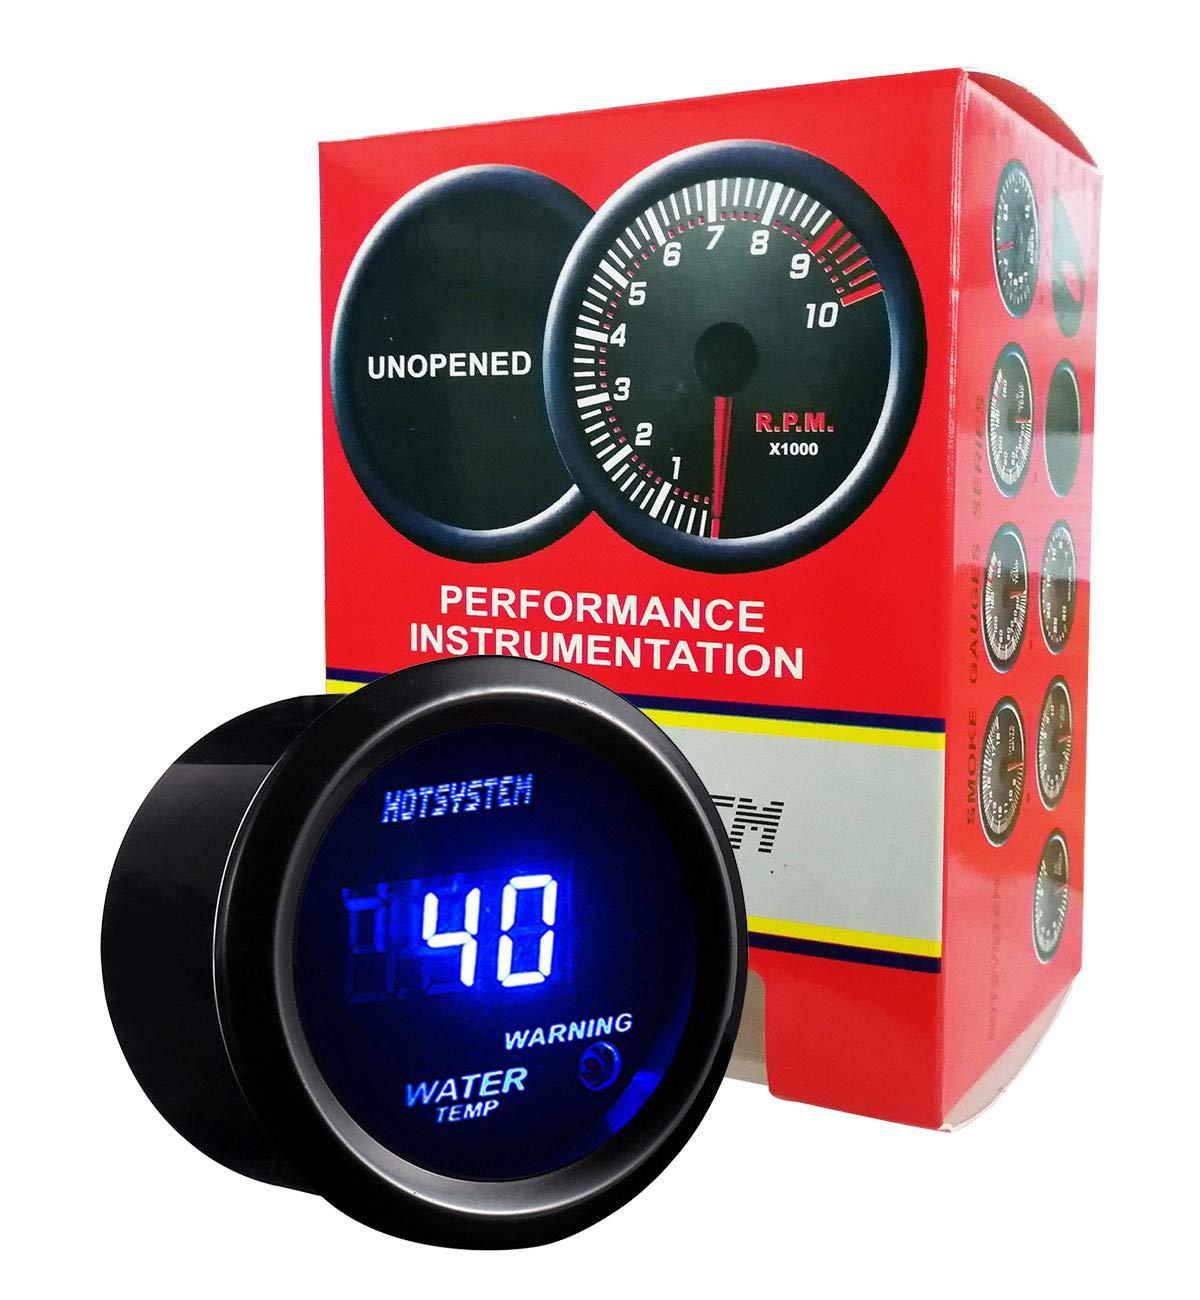 HOTSYSTEM Universal Water Temp Gauge Temperature Meter Blue Digital LED DC12V 2inches 52mm for Car Automotive(Celsius) by HOTSYSTEM